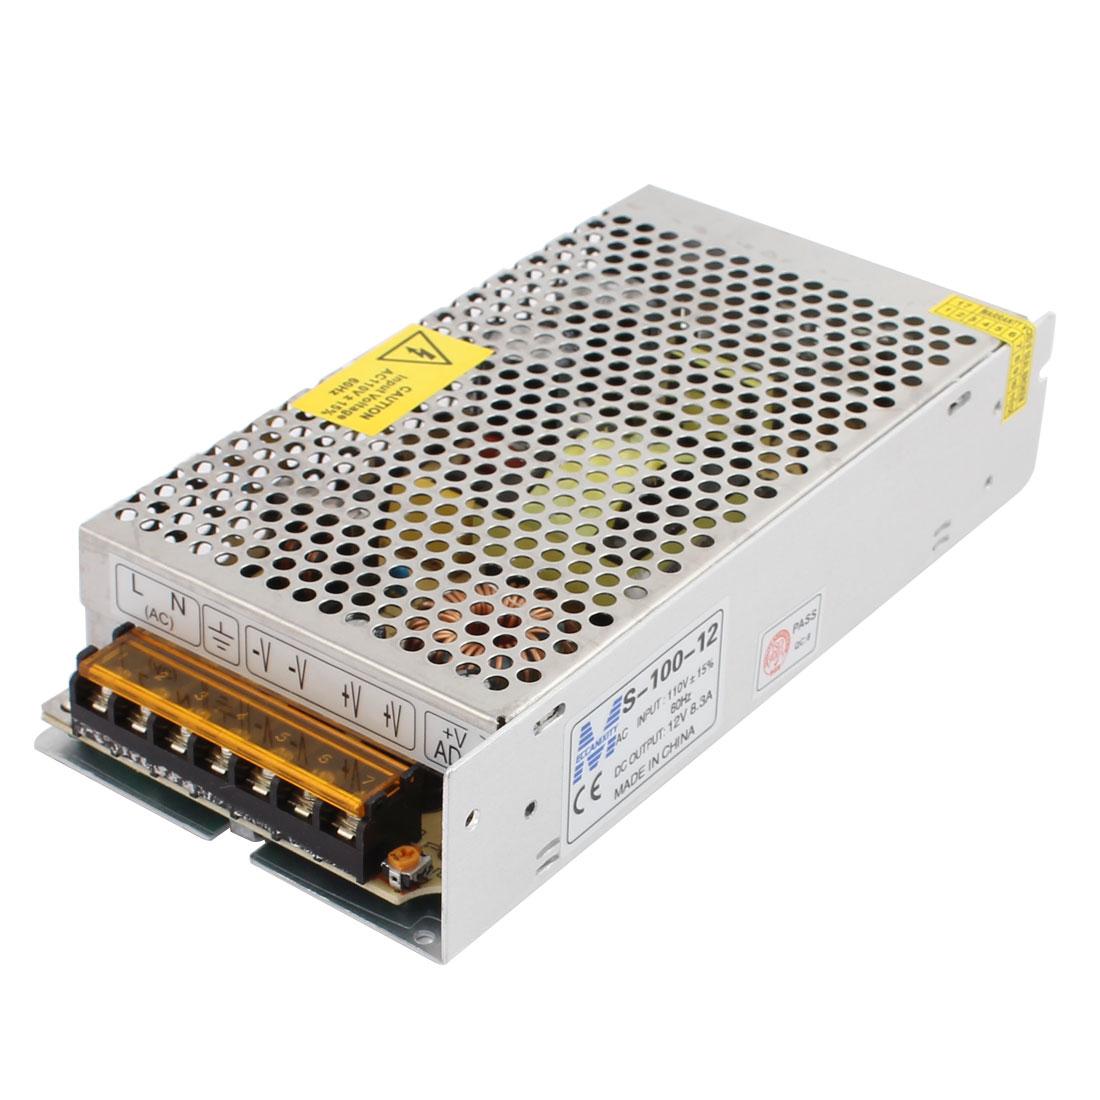 AC 110V/220V to DC 12V 8.3A 100W Switch Power Supply Driver S-100-12 for LED Strip